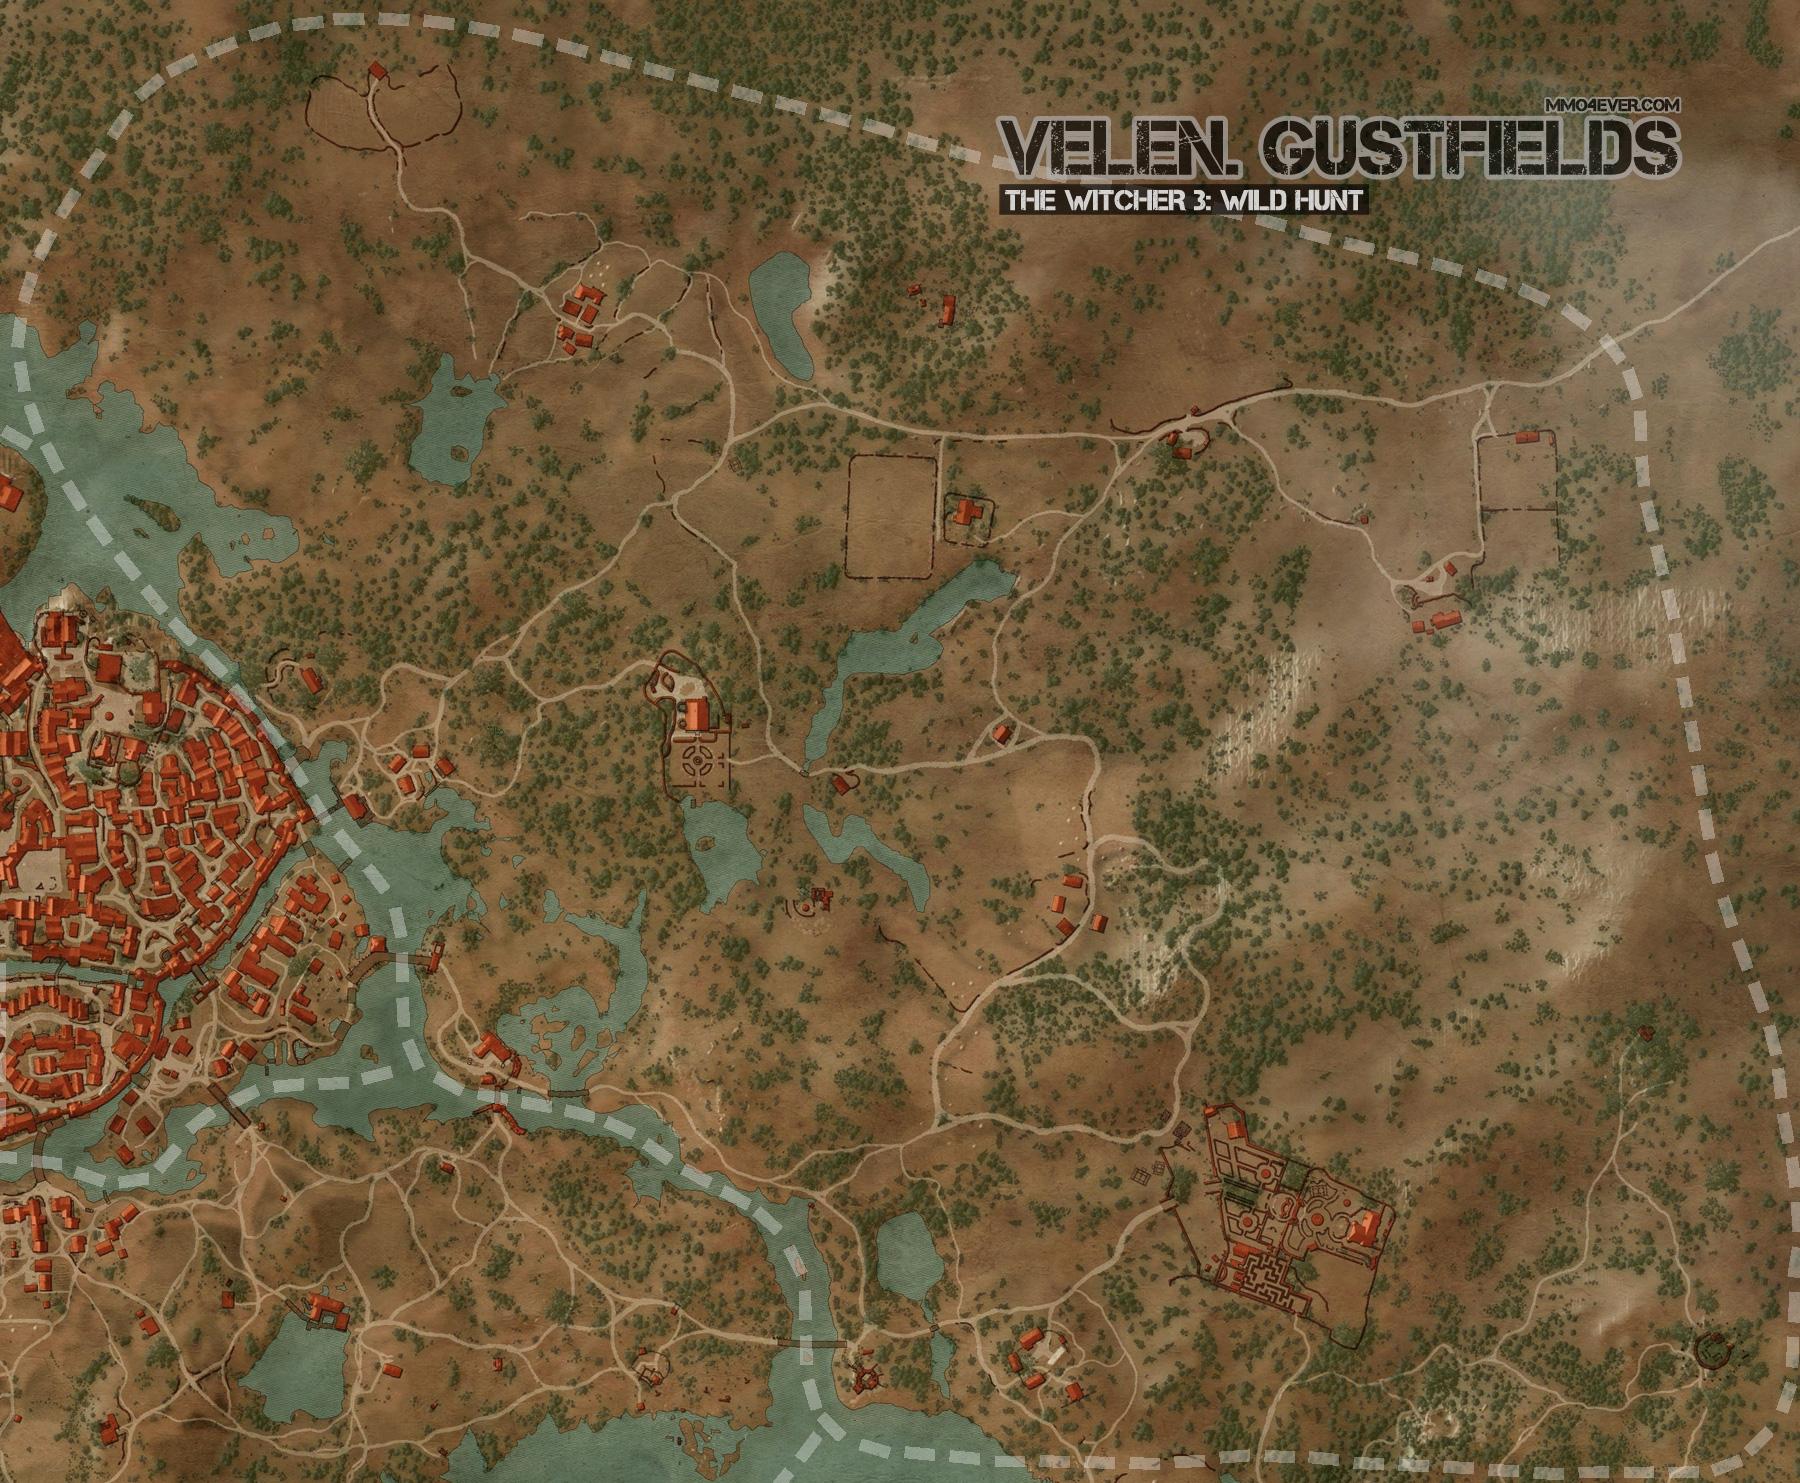 Novigrad-gustfields-the-witcher-3-wild-hunt-map.jpg